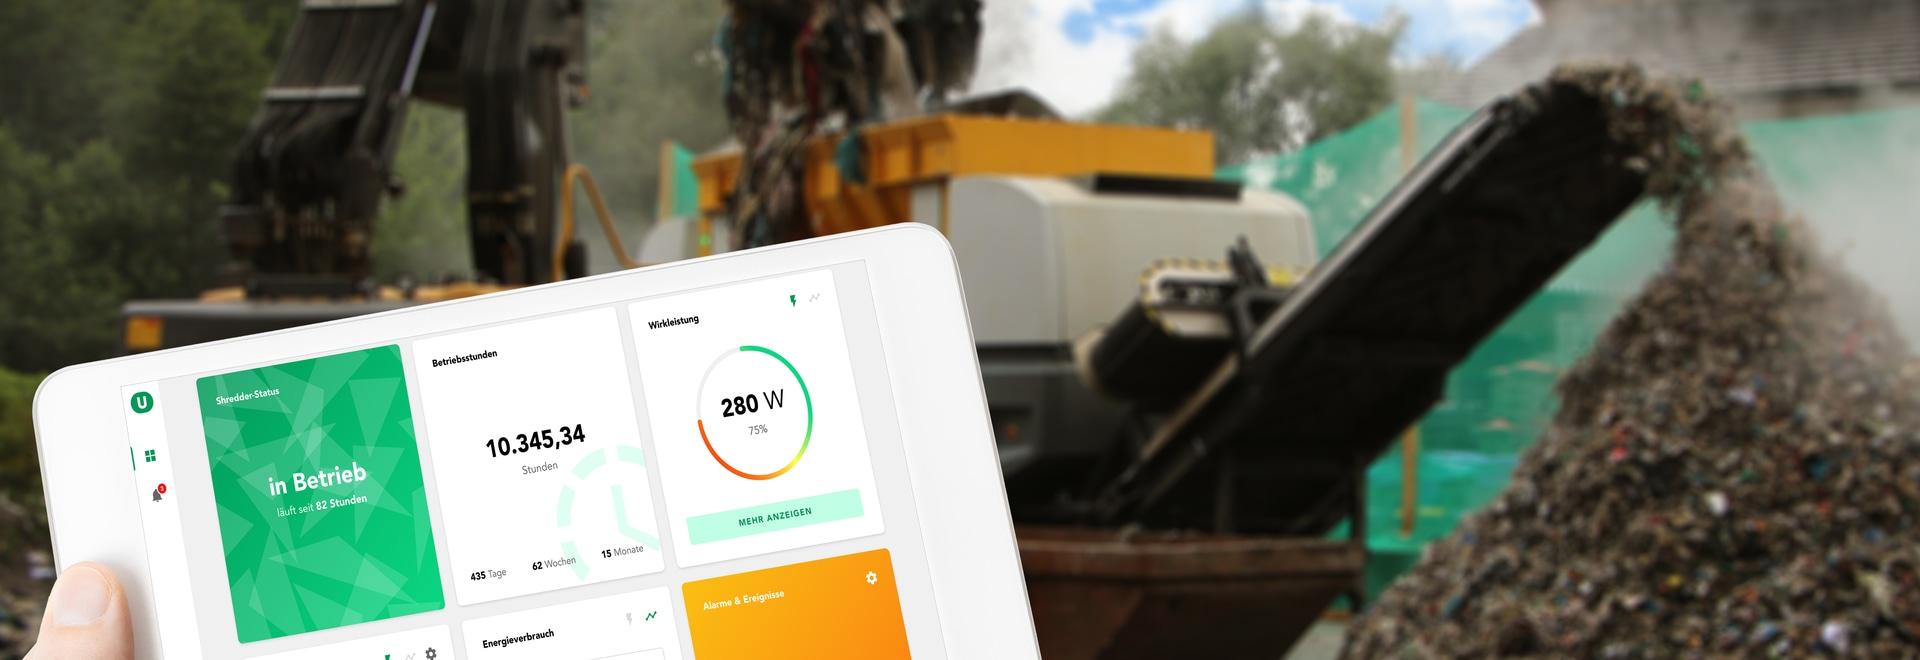 UNTHA develops intelligent monitoring tools for its shredders